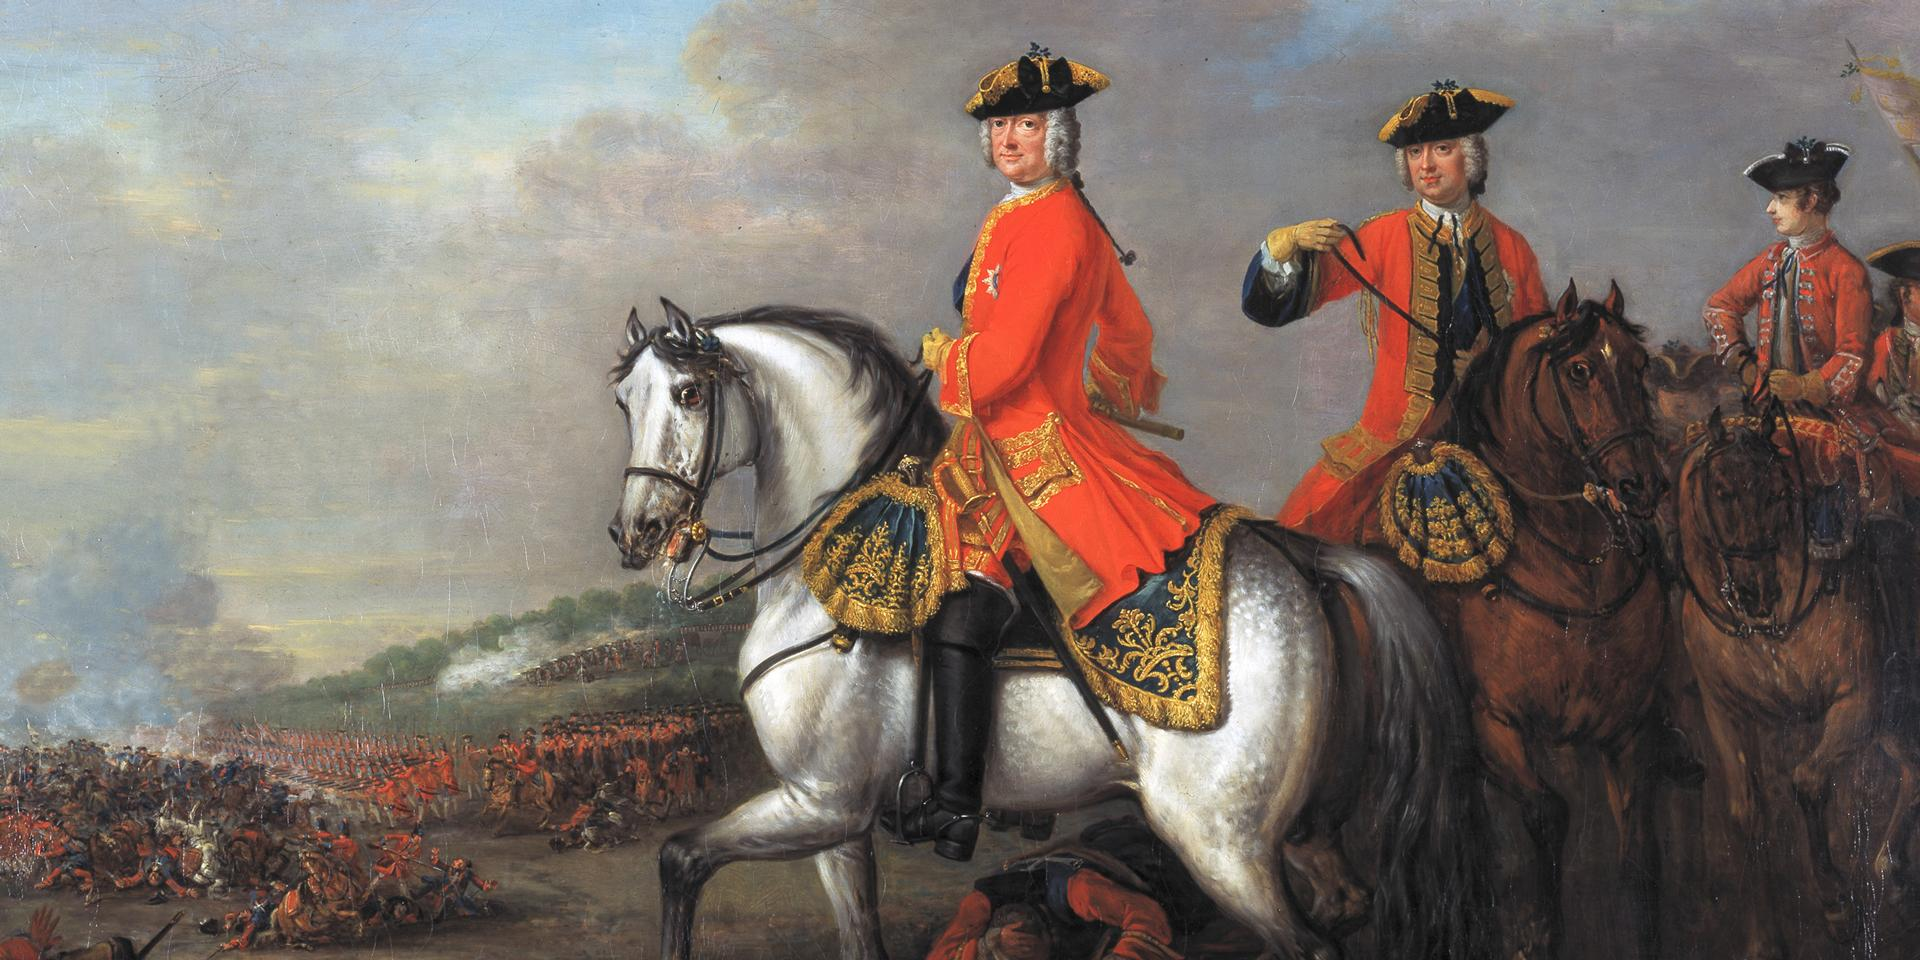 King George II at the Battle of Dettingen, 1743